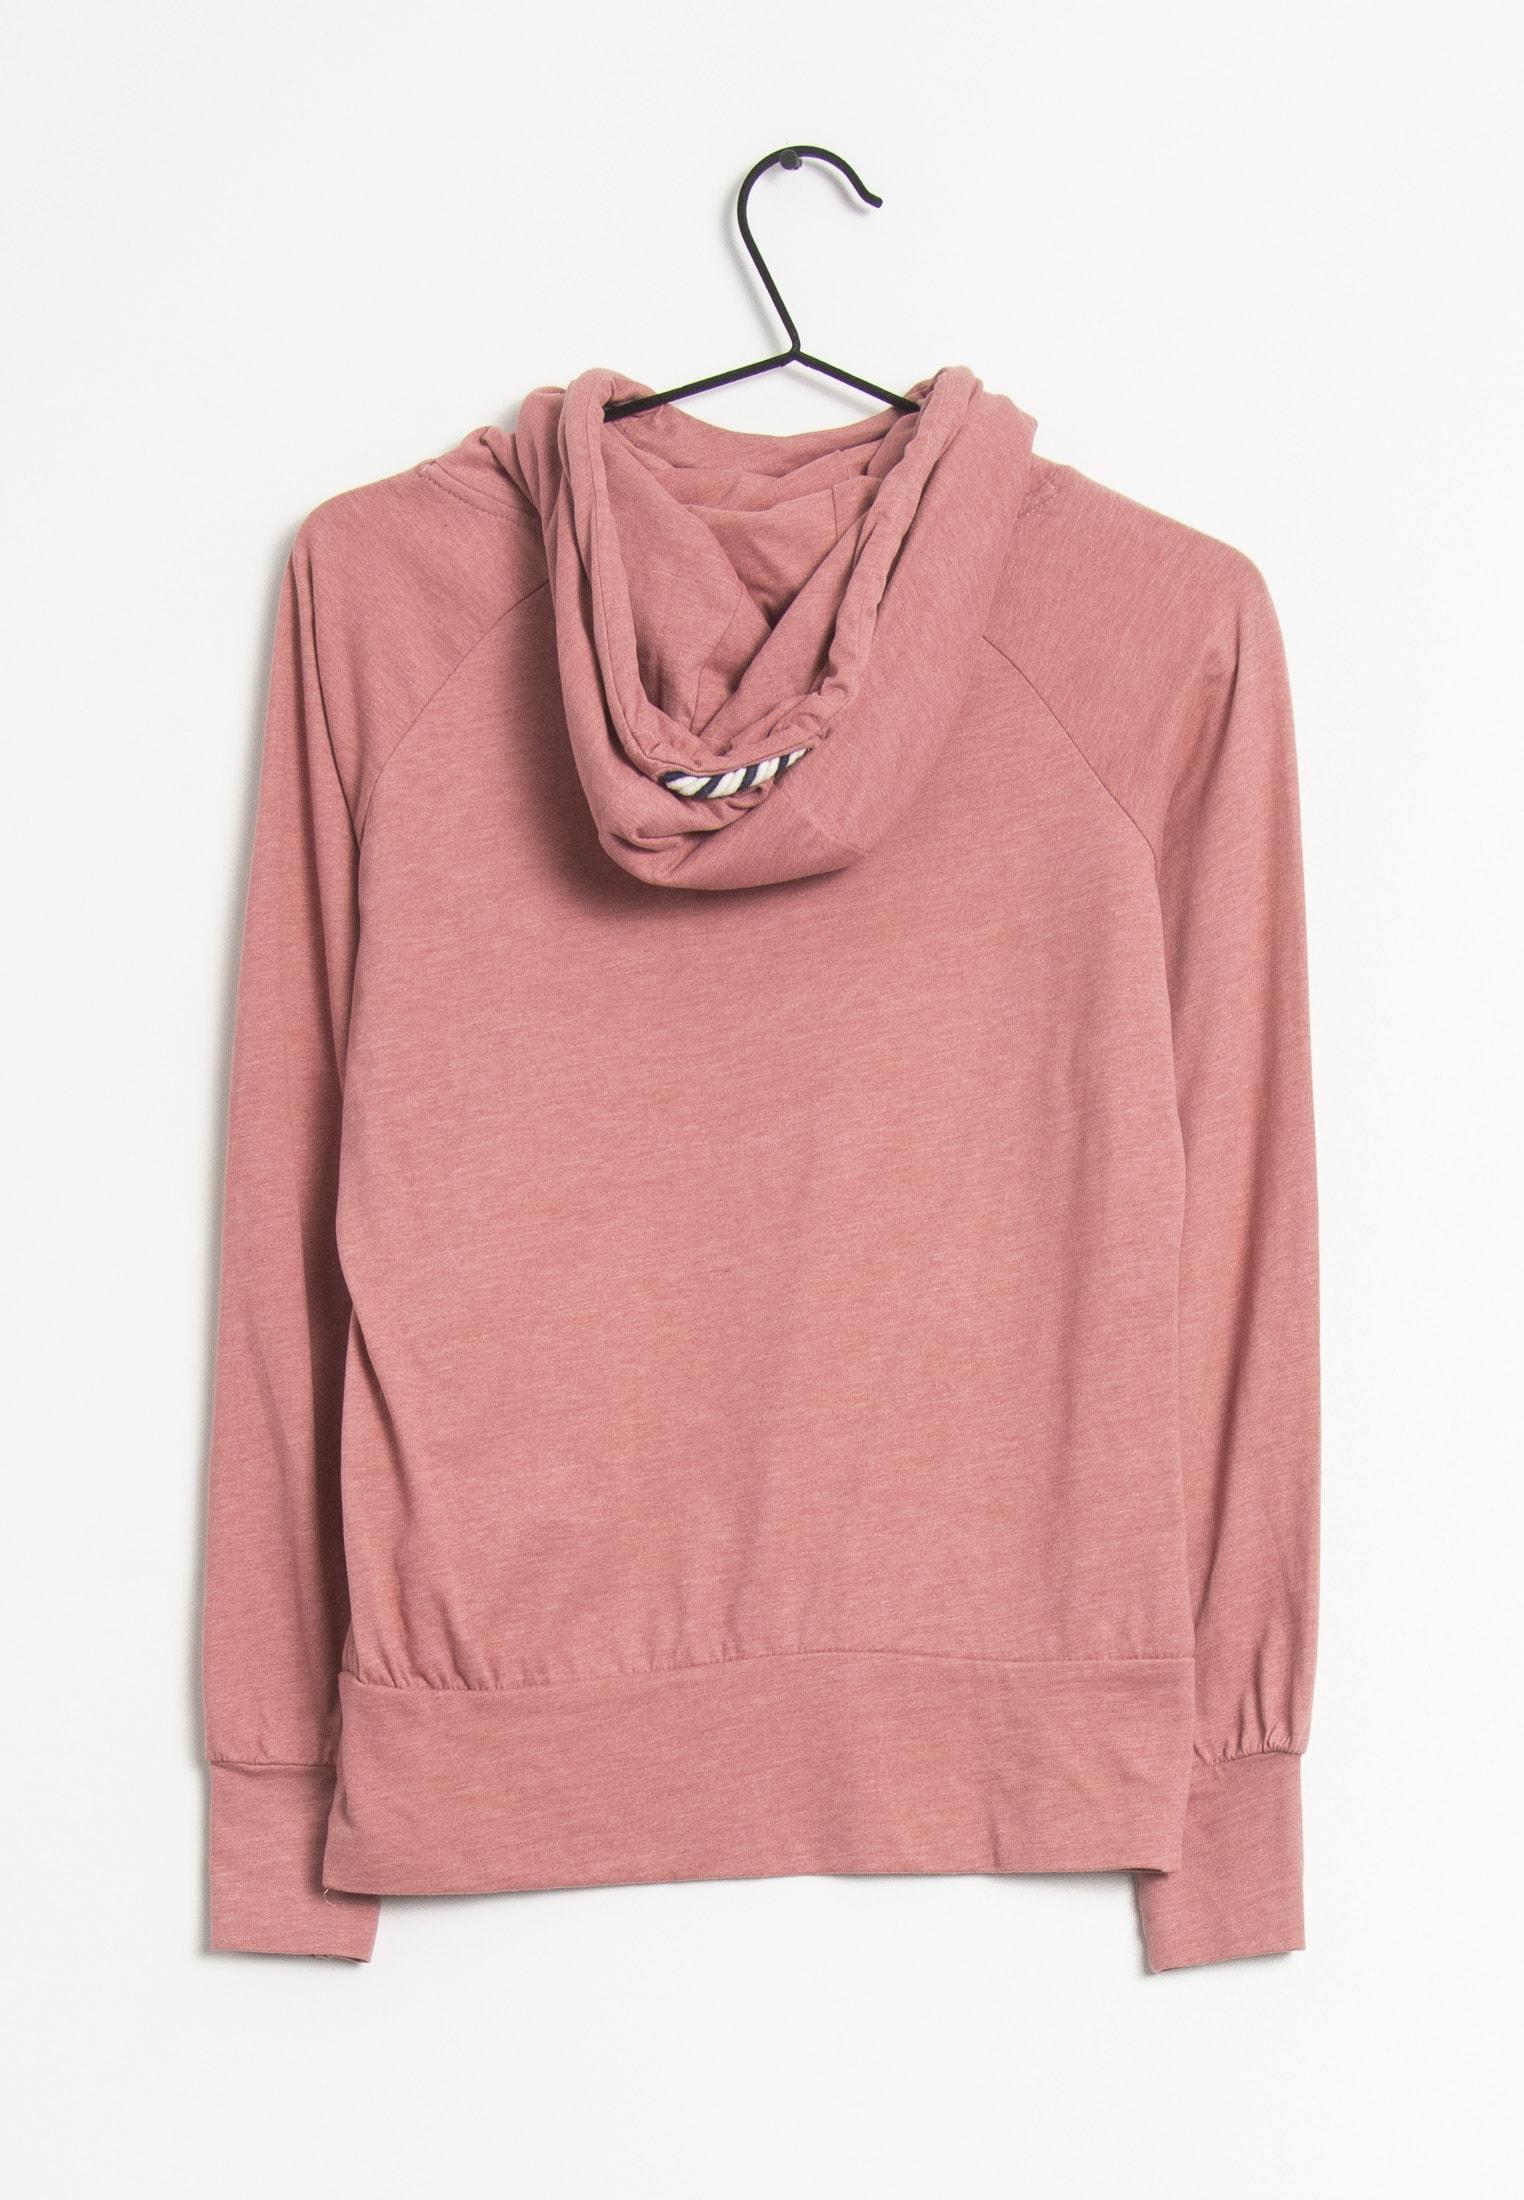 Naketano Sweat / Fleece Pink Gr.XS